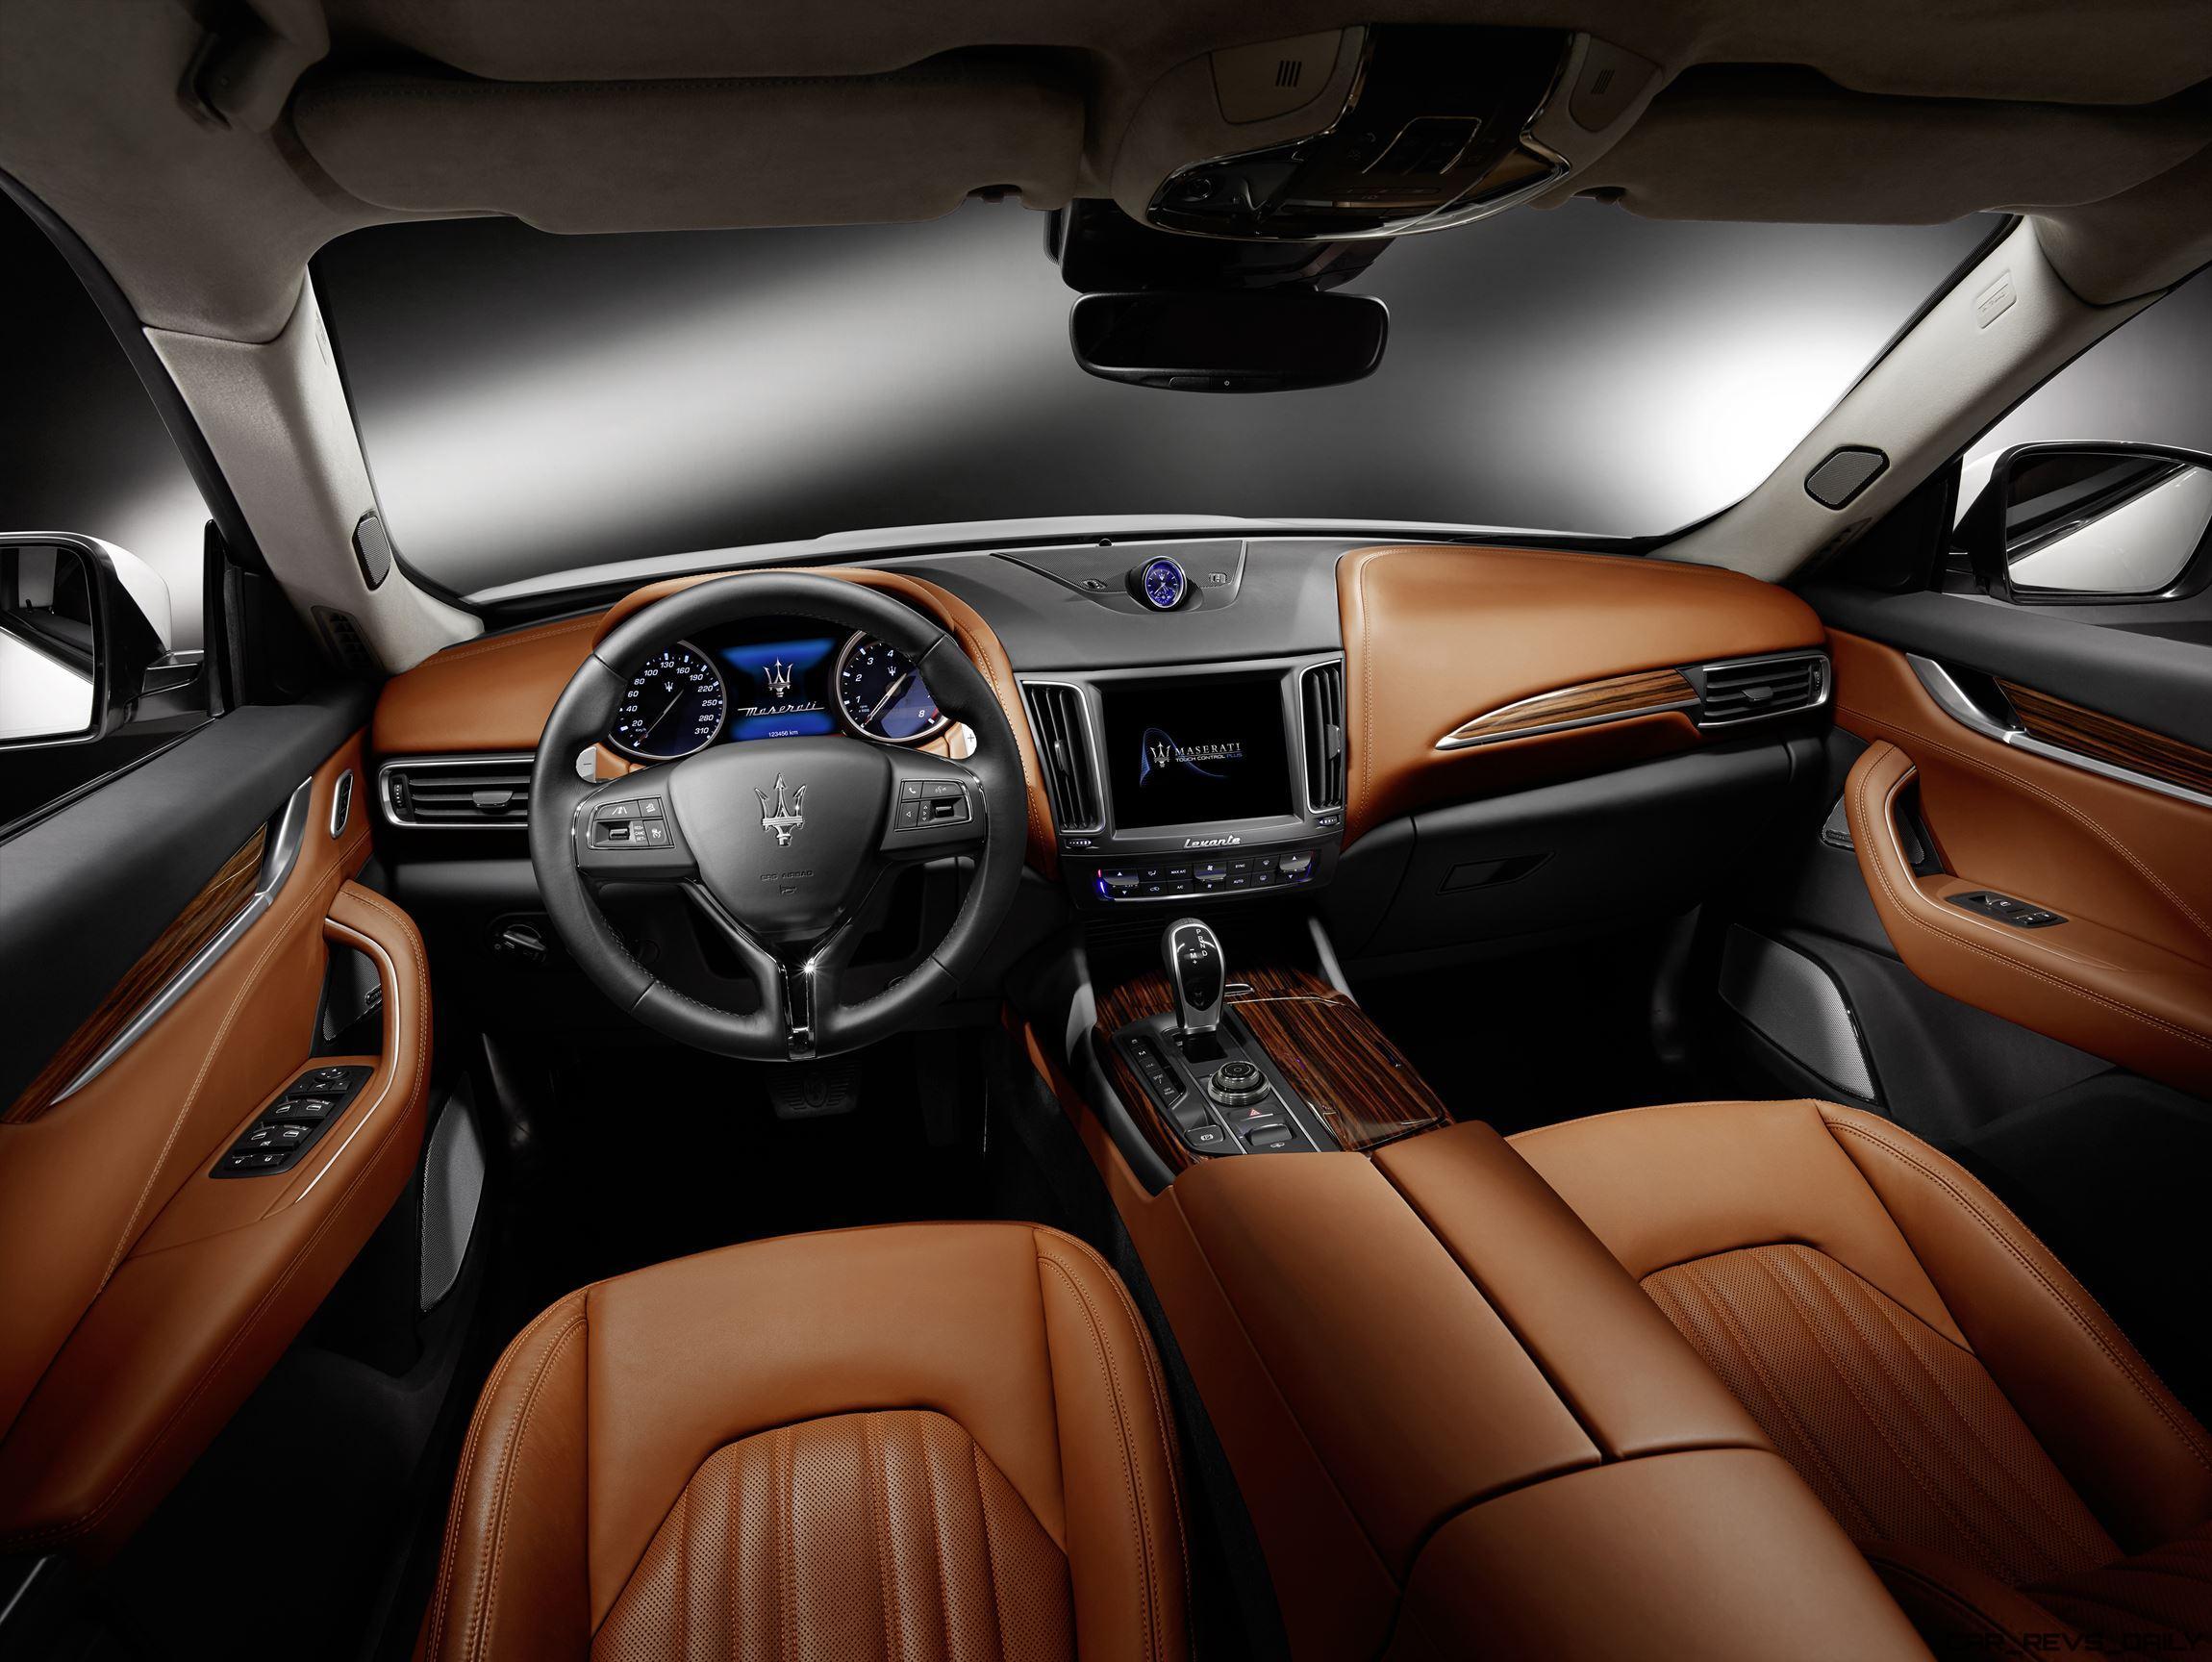 2017 Maserati Levante Interior 4